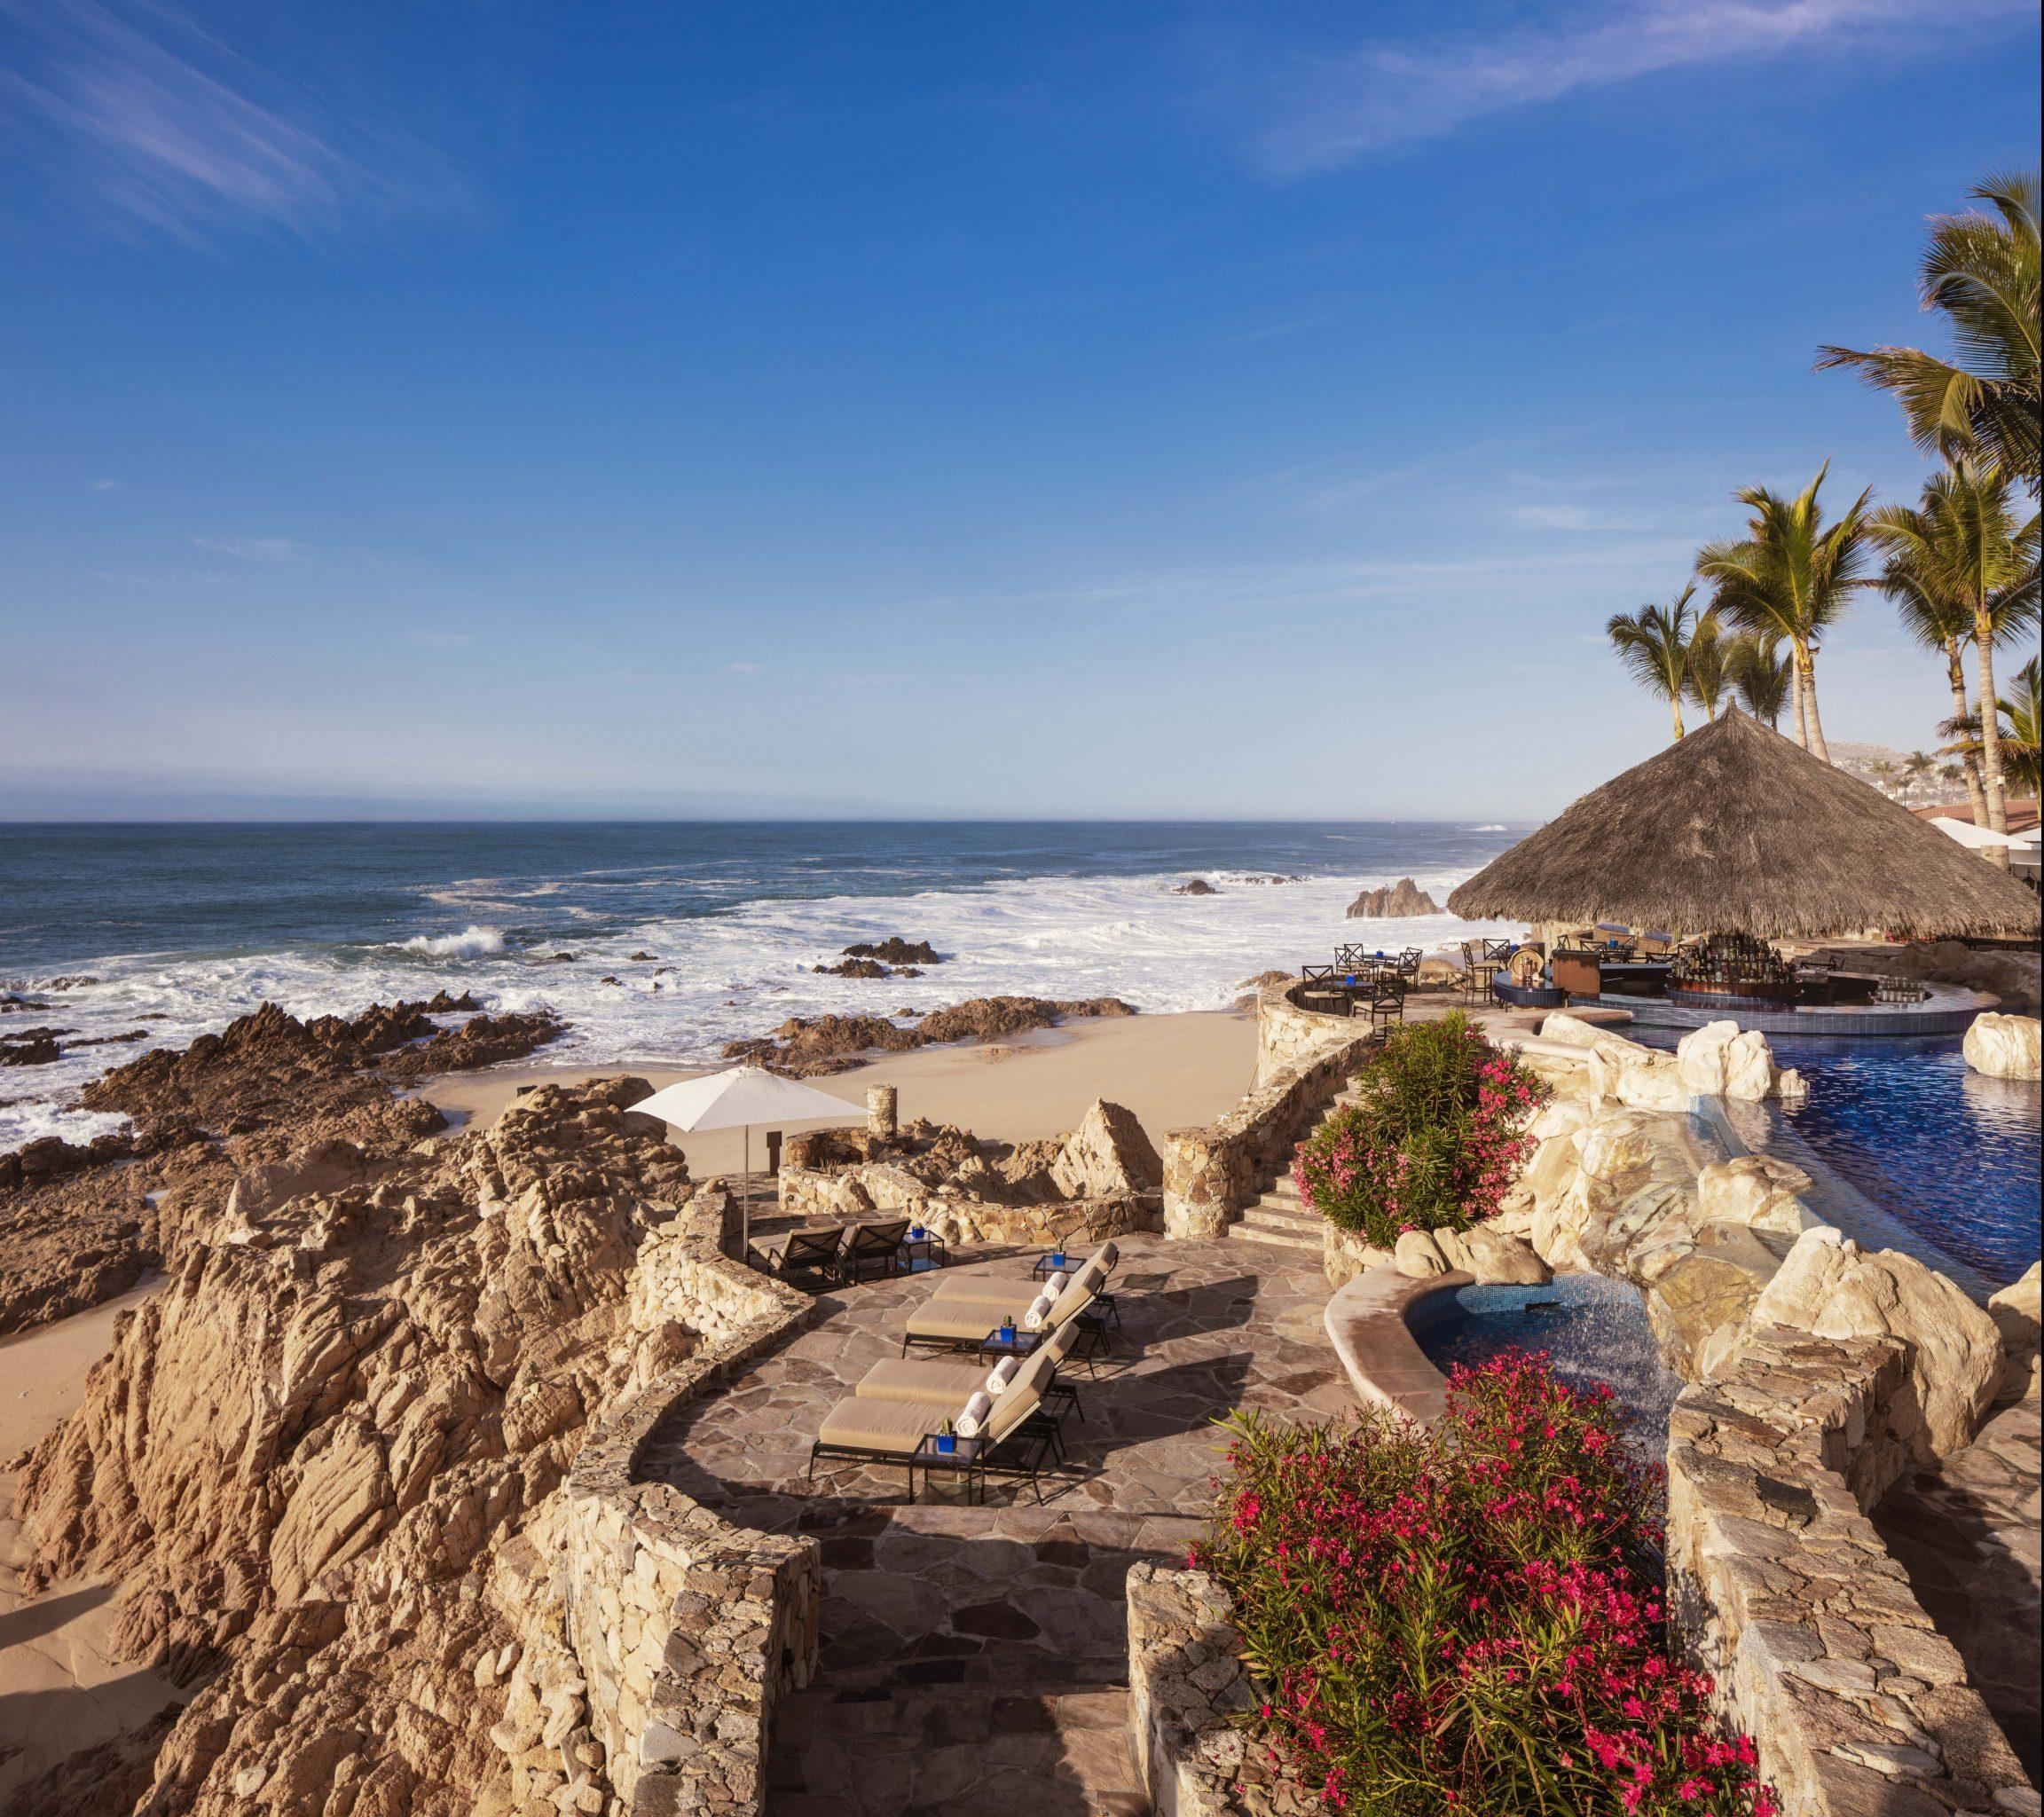 OO_Palmilla_Pool&Beach_VistaPool_Seascape_3285-Pano_MASTER